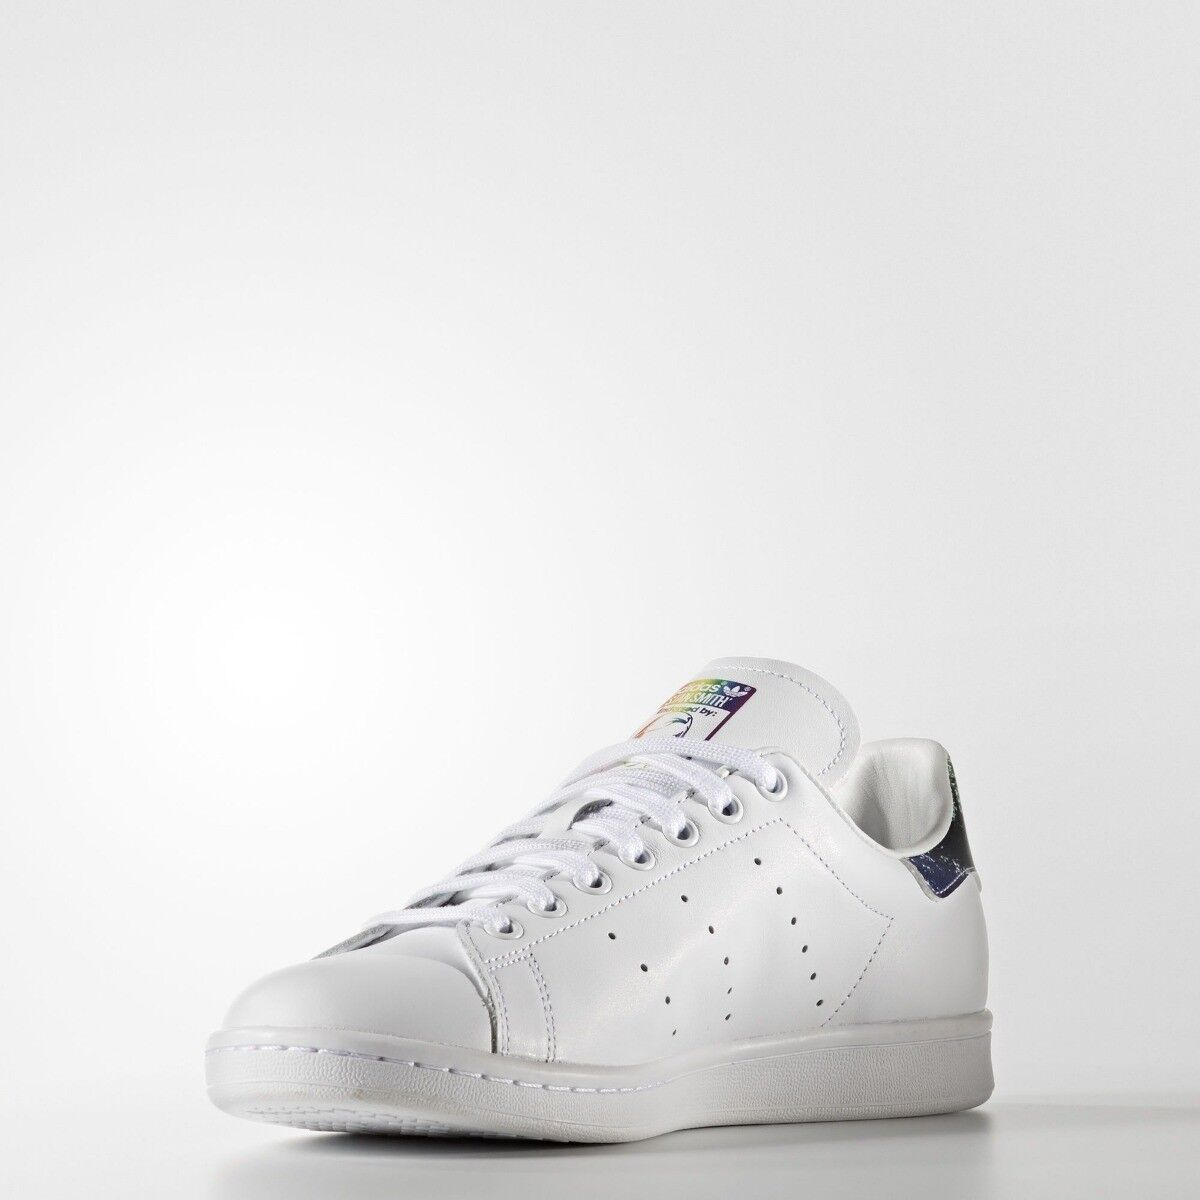 Adidas Superstar mujer zapatillas Número 5 6.5 blanco plata 40  e6b27c26c0bdf